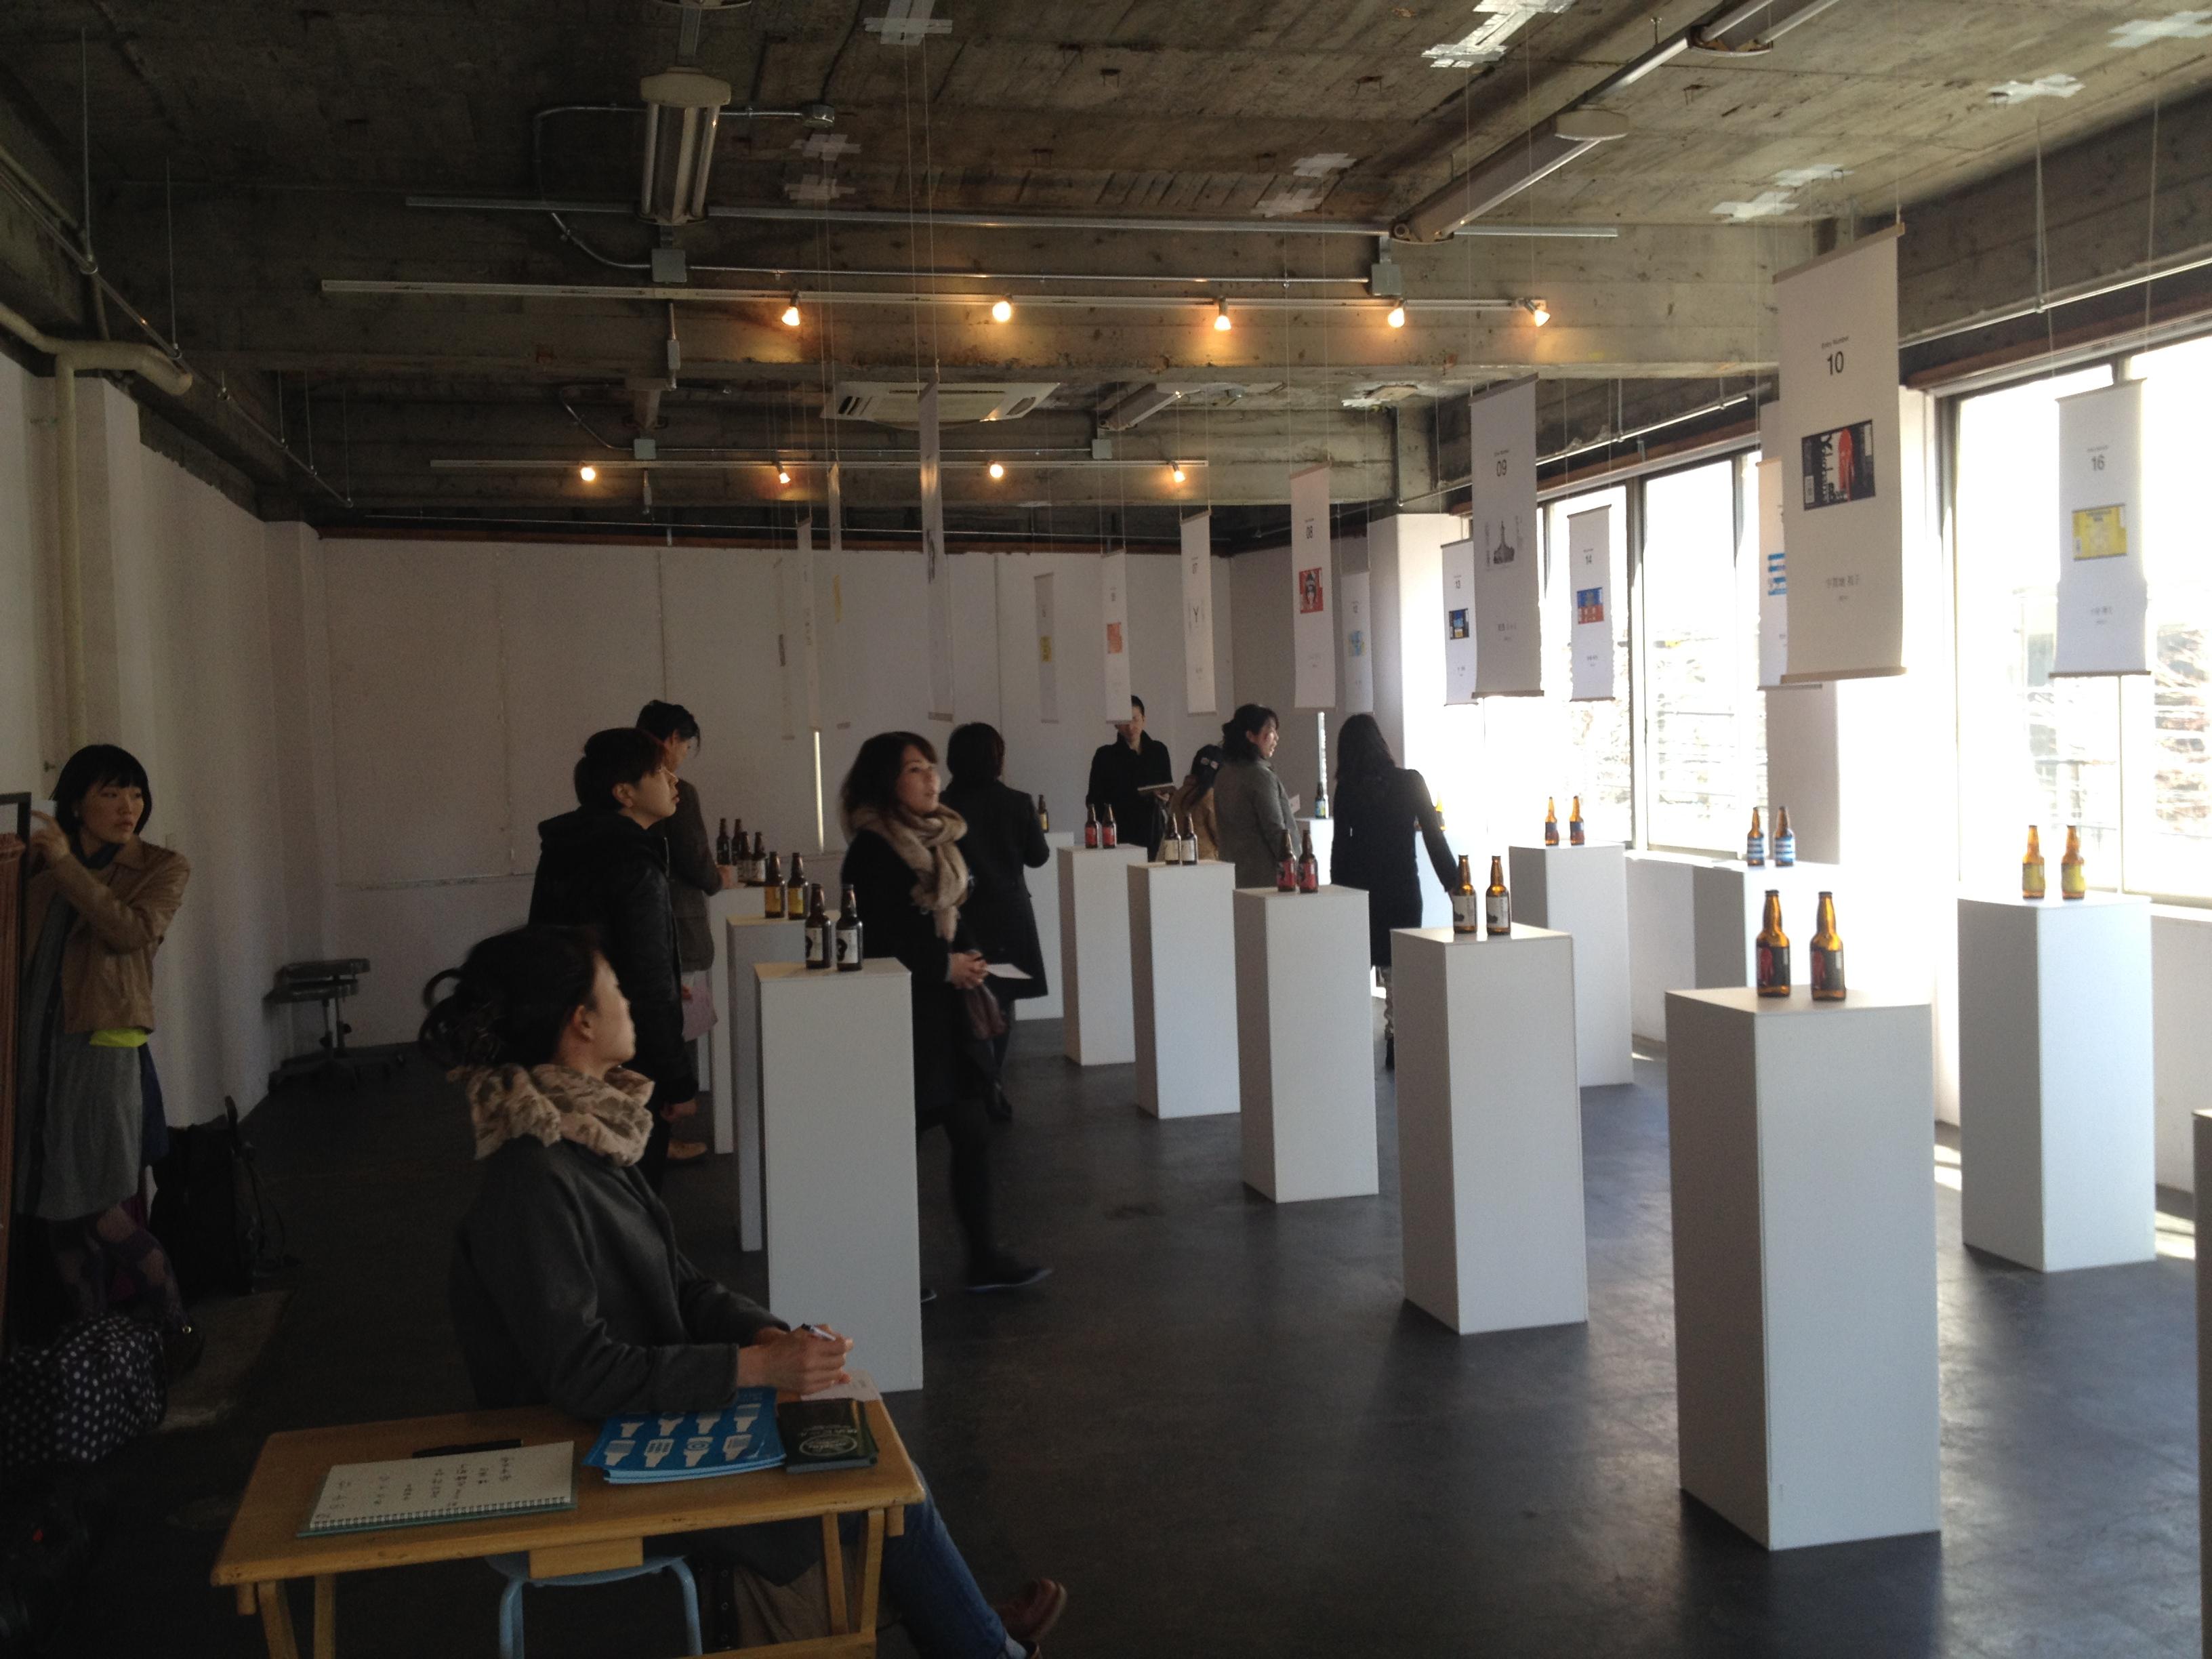 http://www.kanagawa-jagda.com/event/photo/IMG_1889.JPG